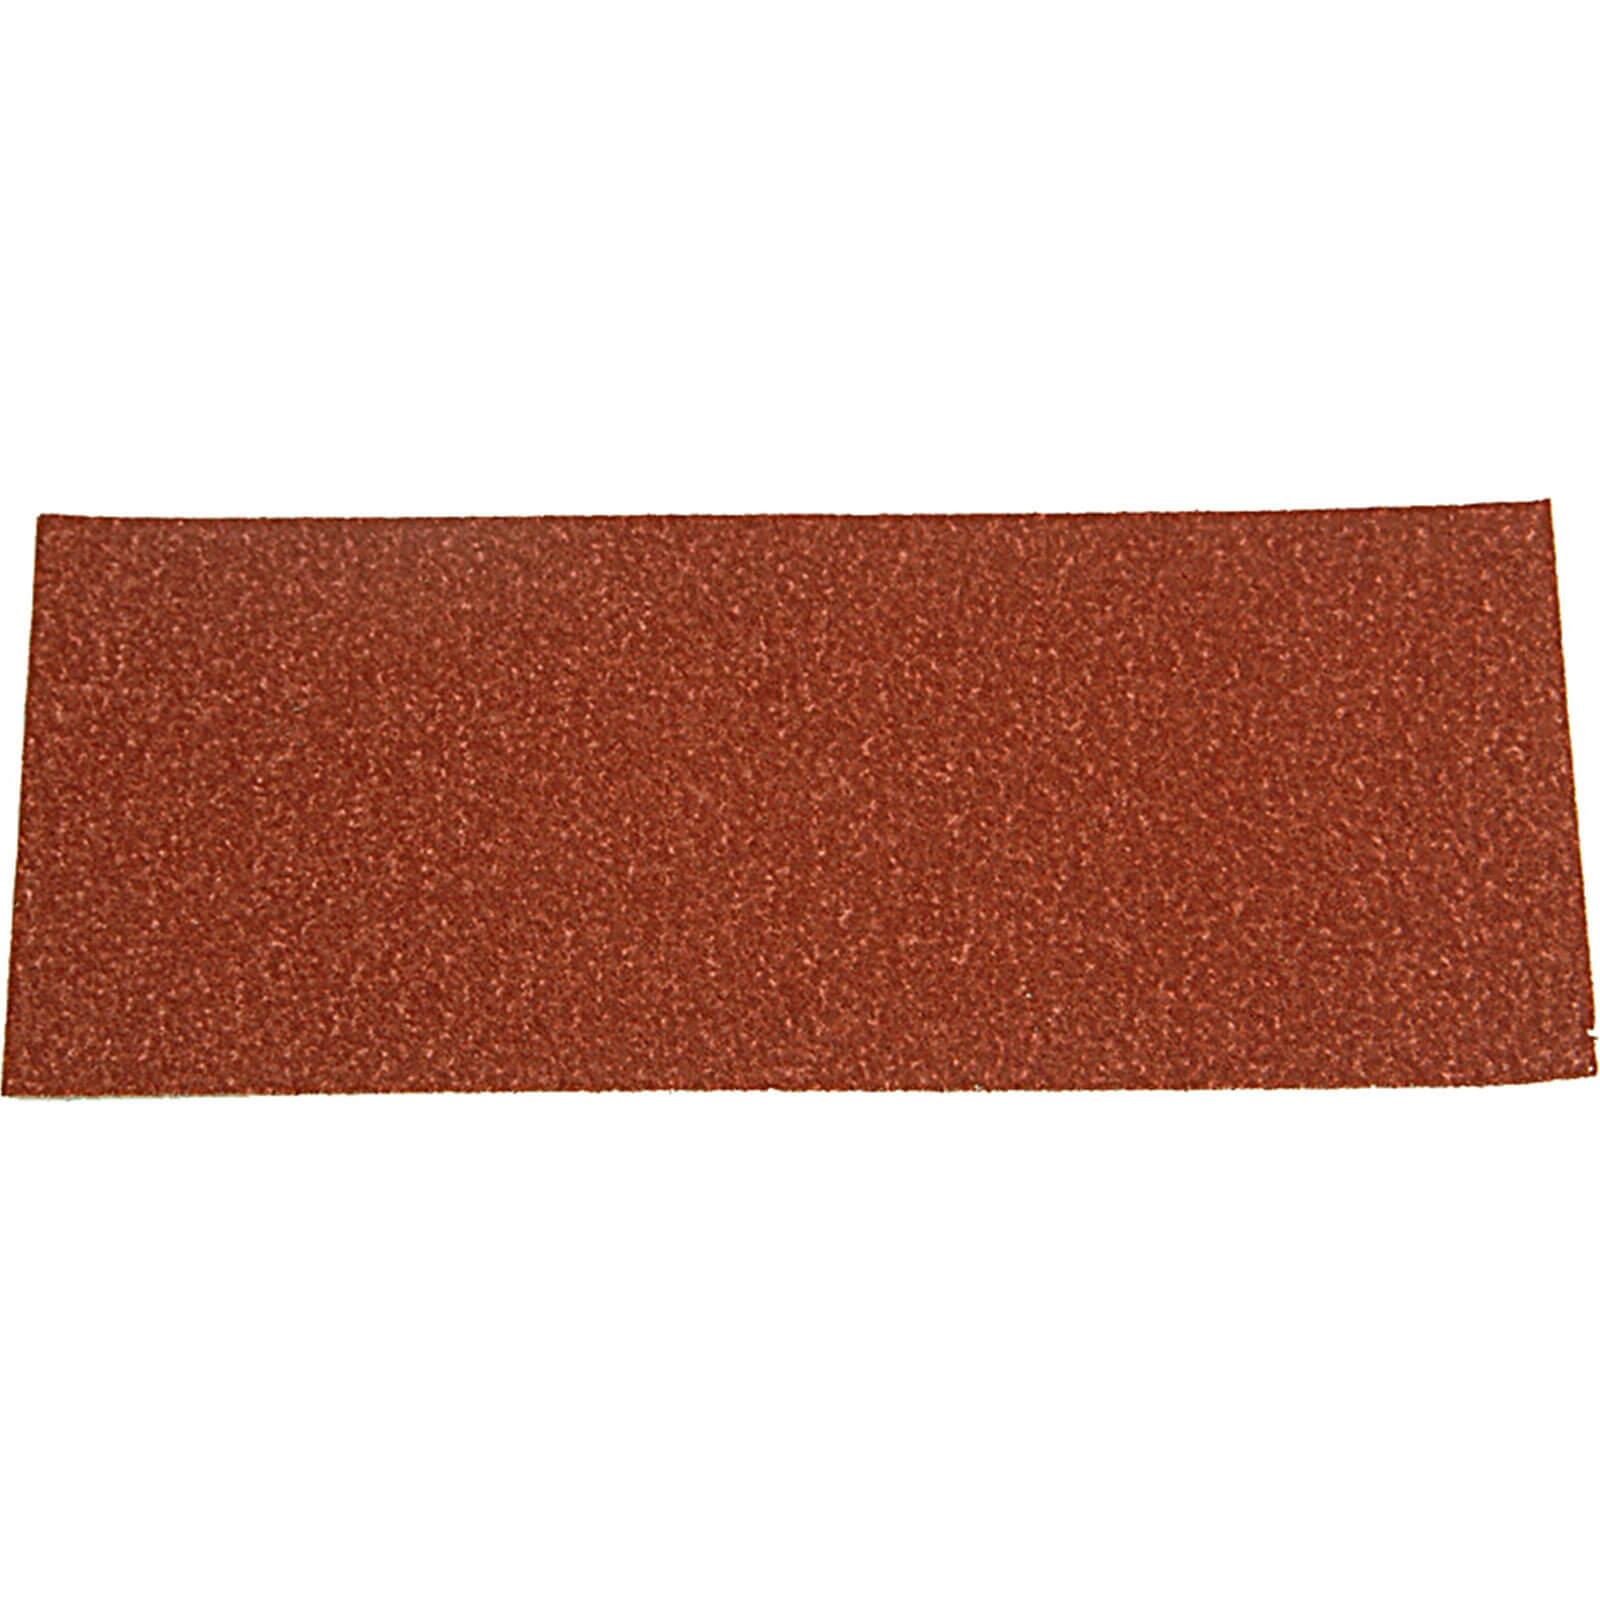 Image of Black & Decker 1/3 Sanding Sheets 100g Pack of 5